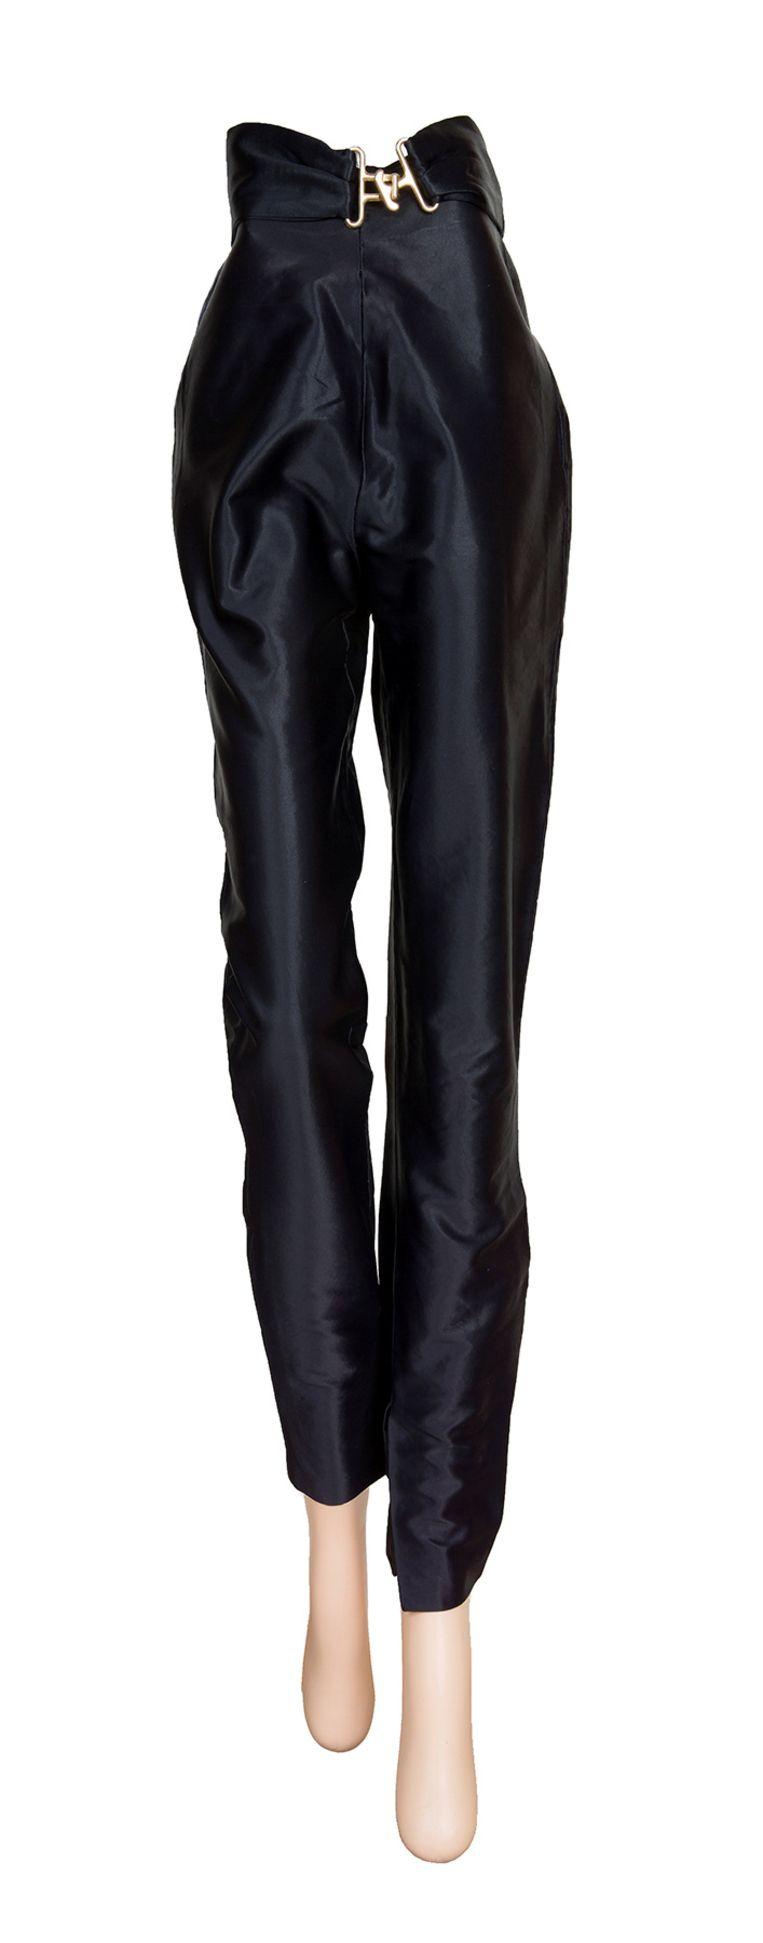 De hoge broek die Olivia Newton-John droeg in 'Grease' wordt geveild.